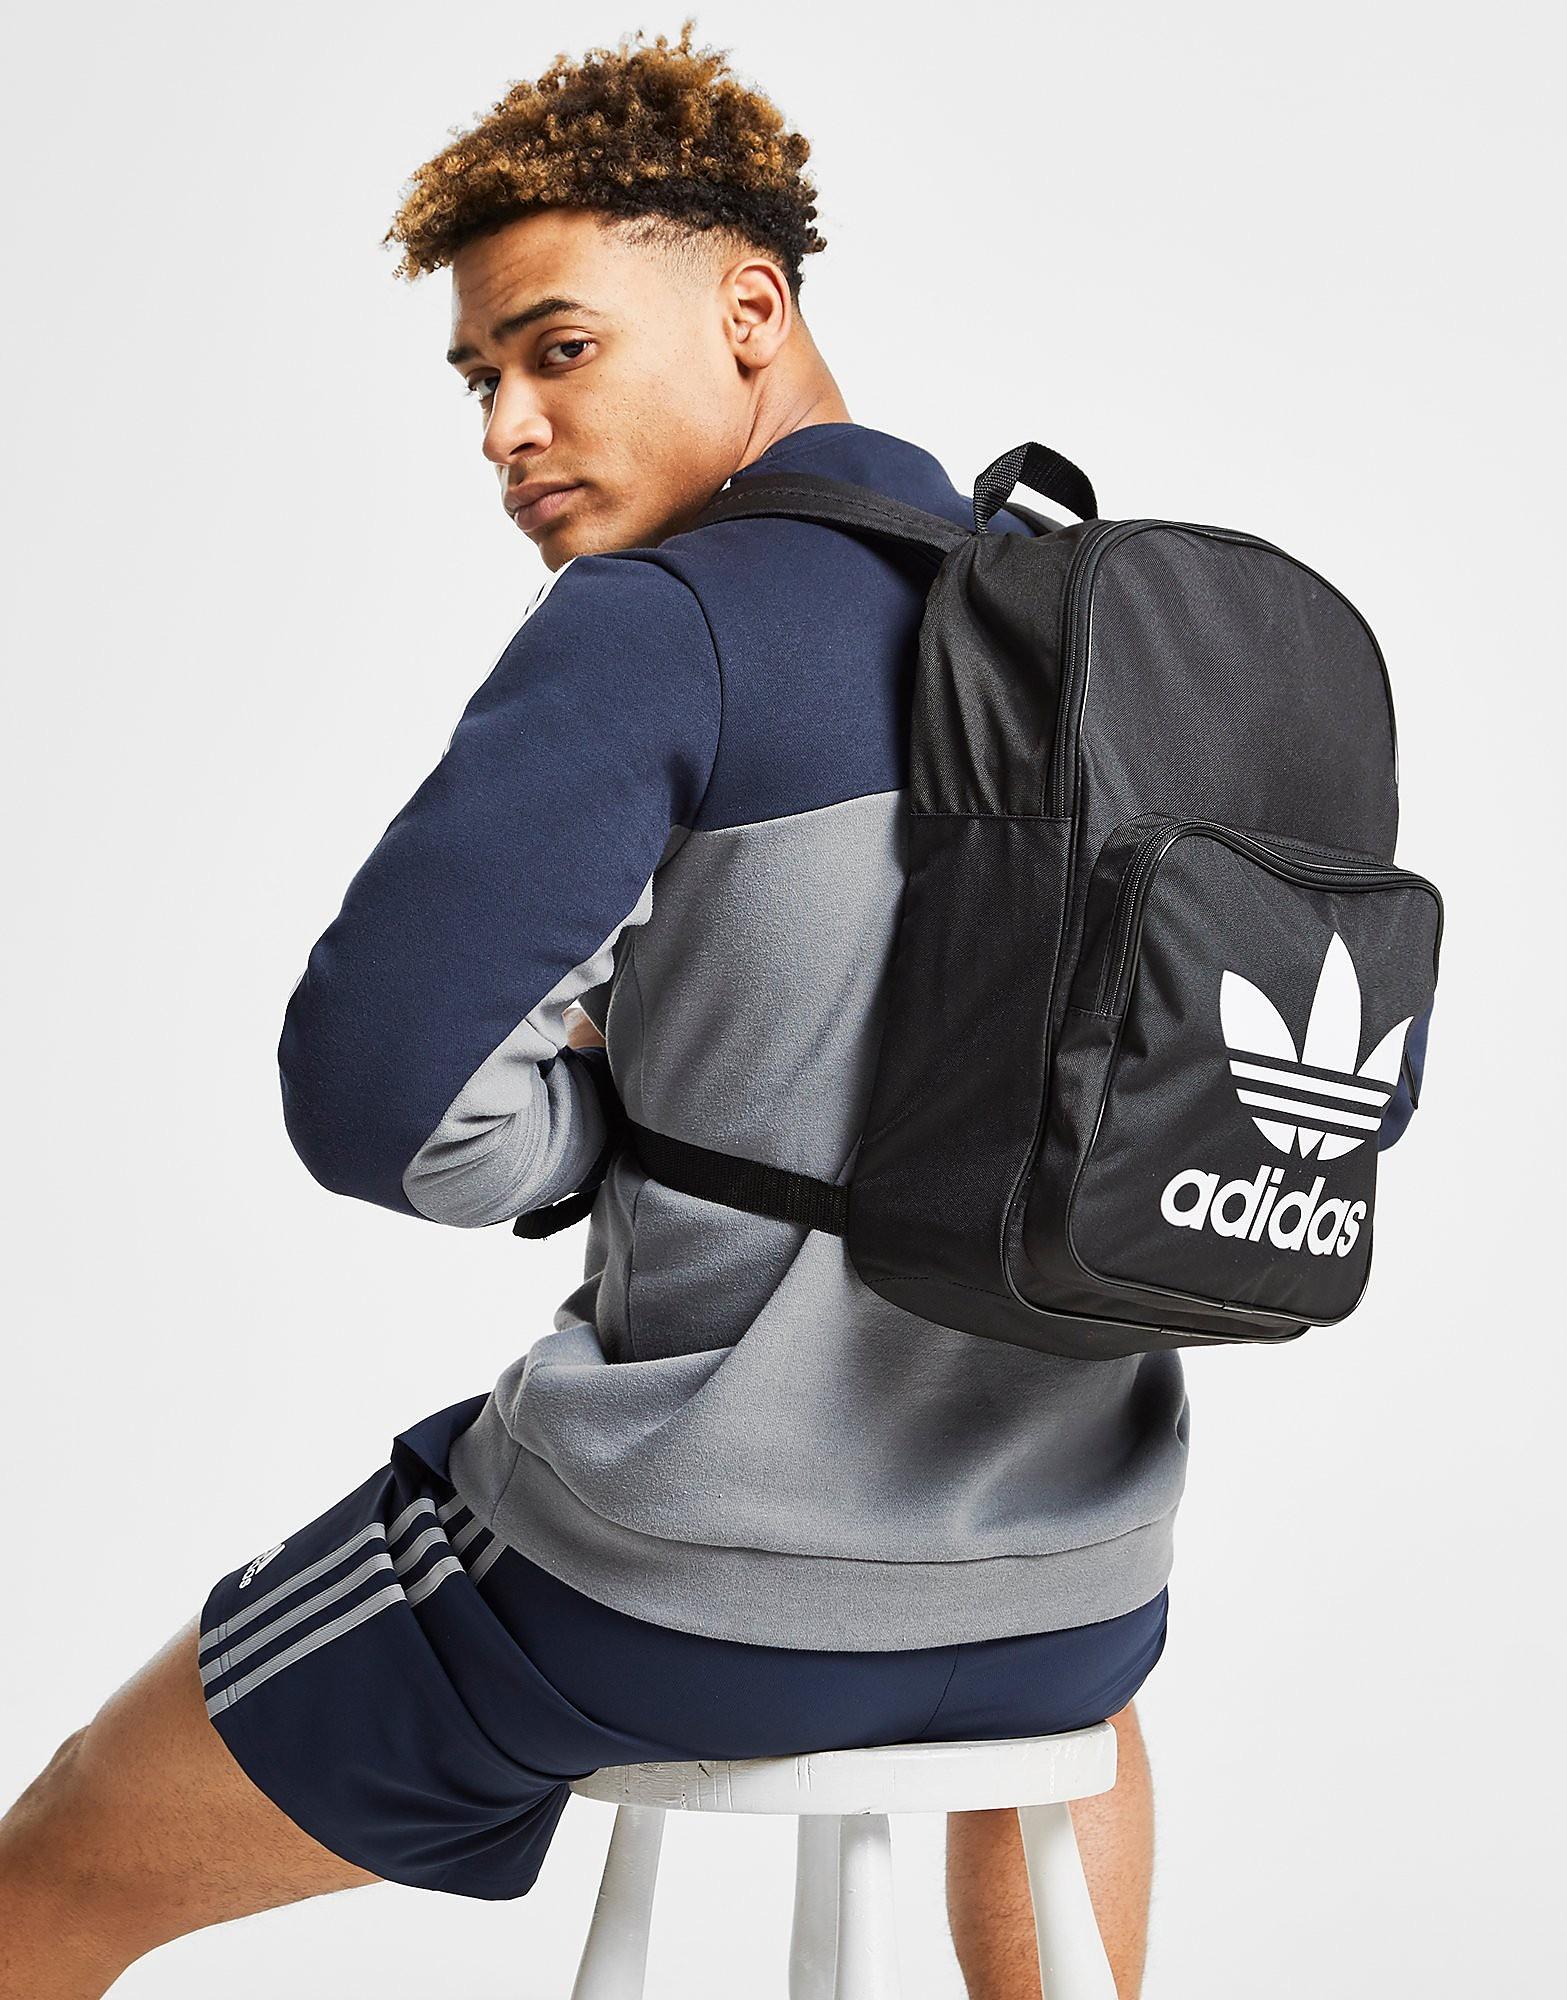 Adidas sporttas zwart